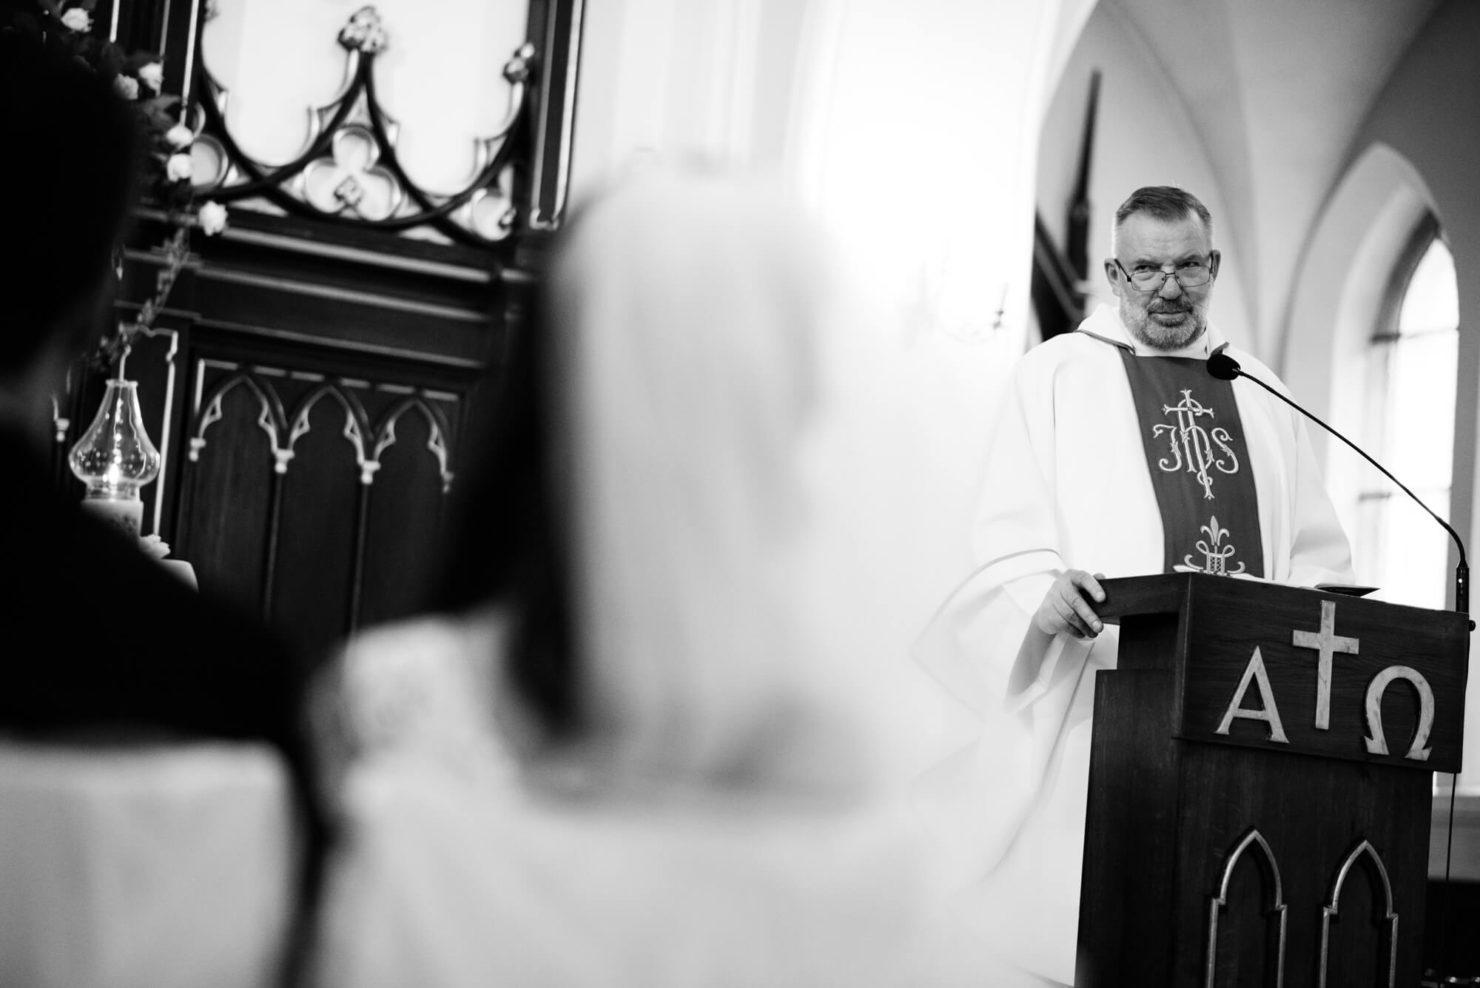 Klaudia i Michał - Wesele w Villi Juliannie - wesele w villi juliannie